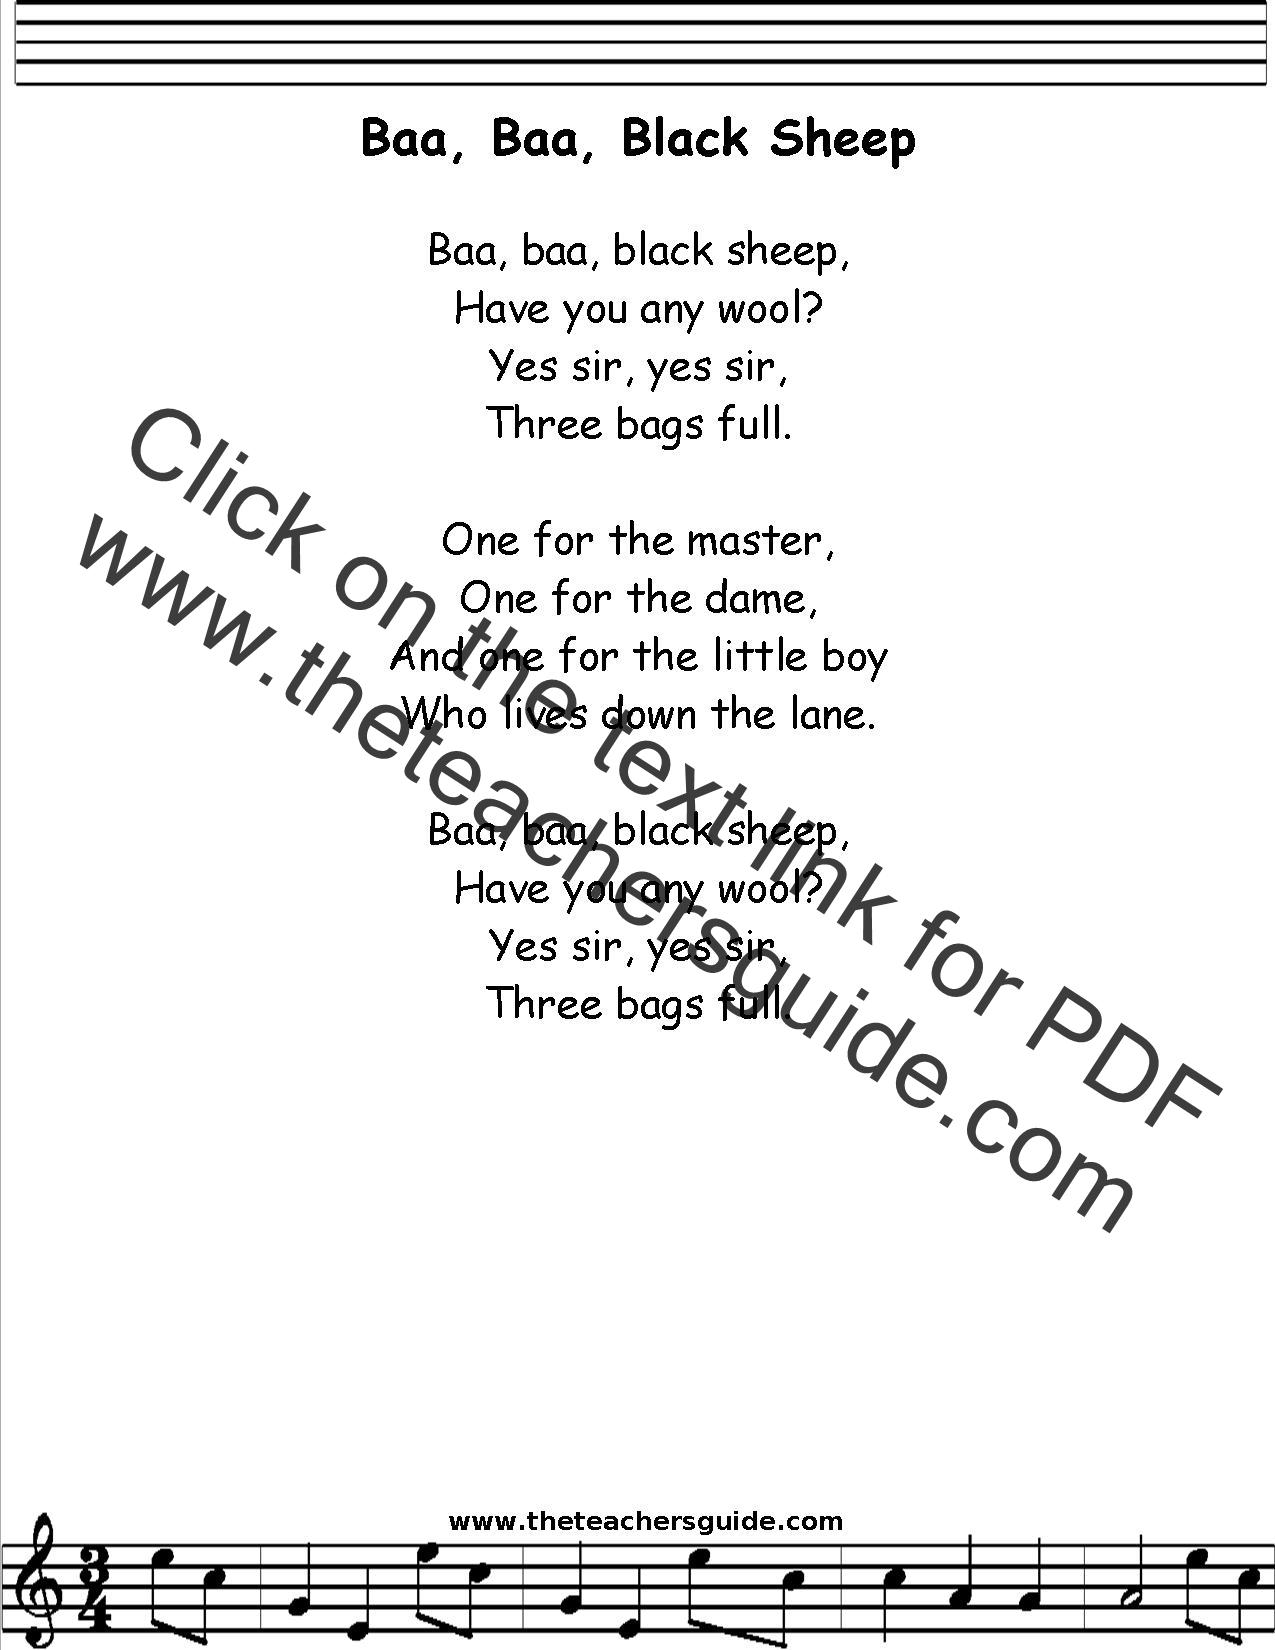 Baa Baa Black Sheep Lyrics Printout Midi And Video